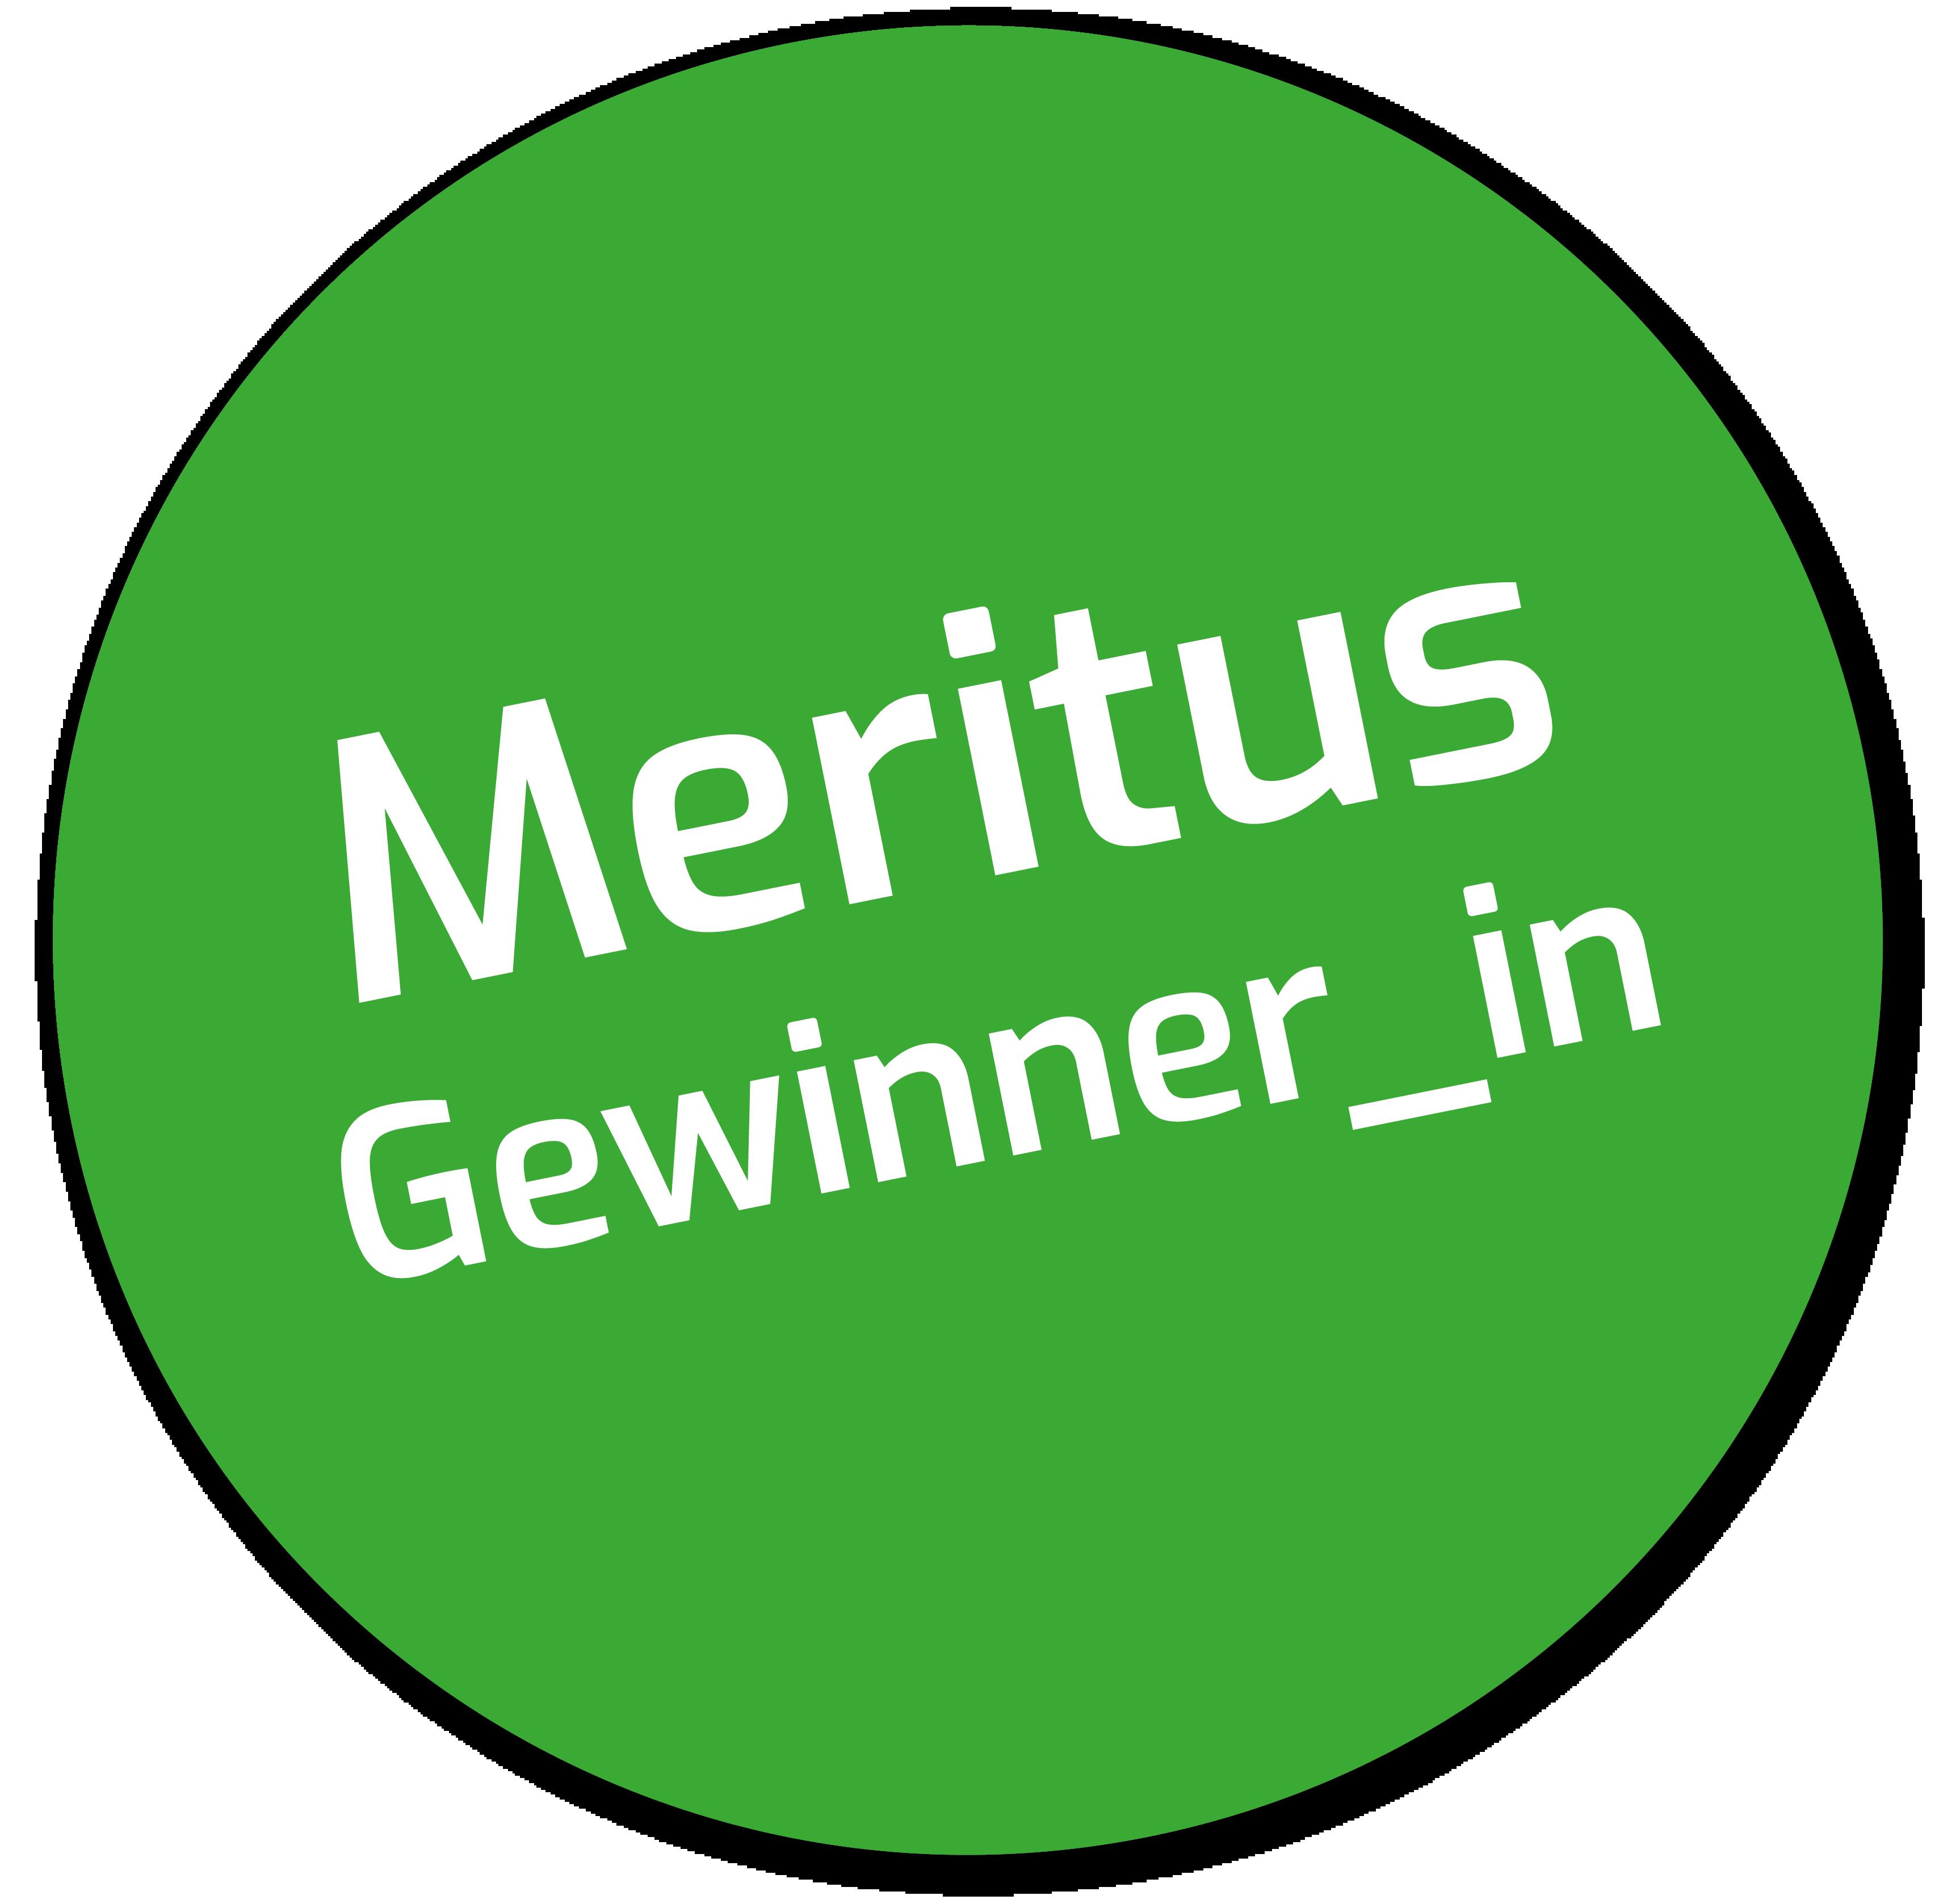 Meritus_Gewinner_in